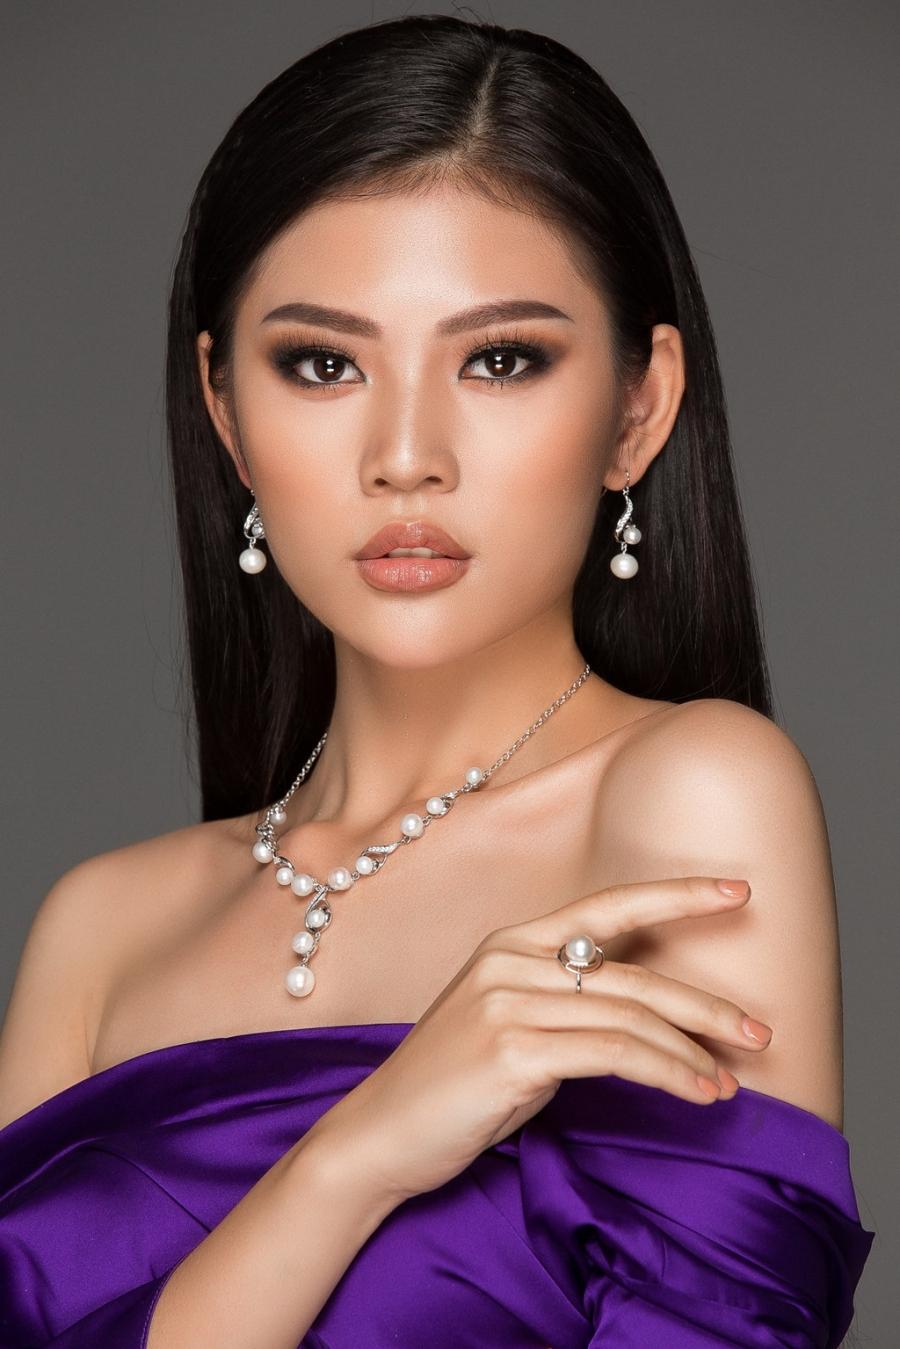 Can canh nhan sac cac thi sinh dep nhat Top 70 Hoa hau Hoan vu VN hinh anh 7